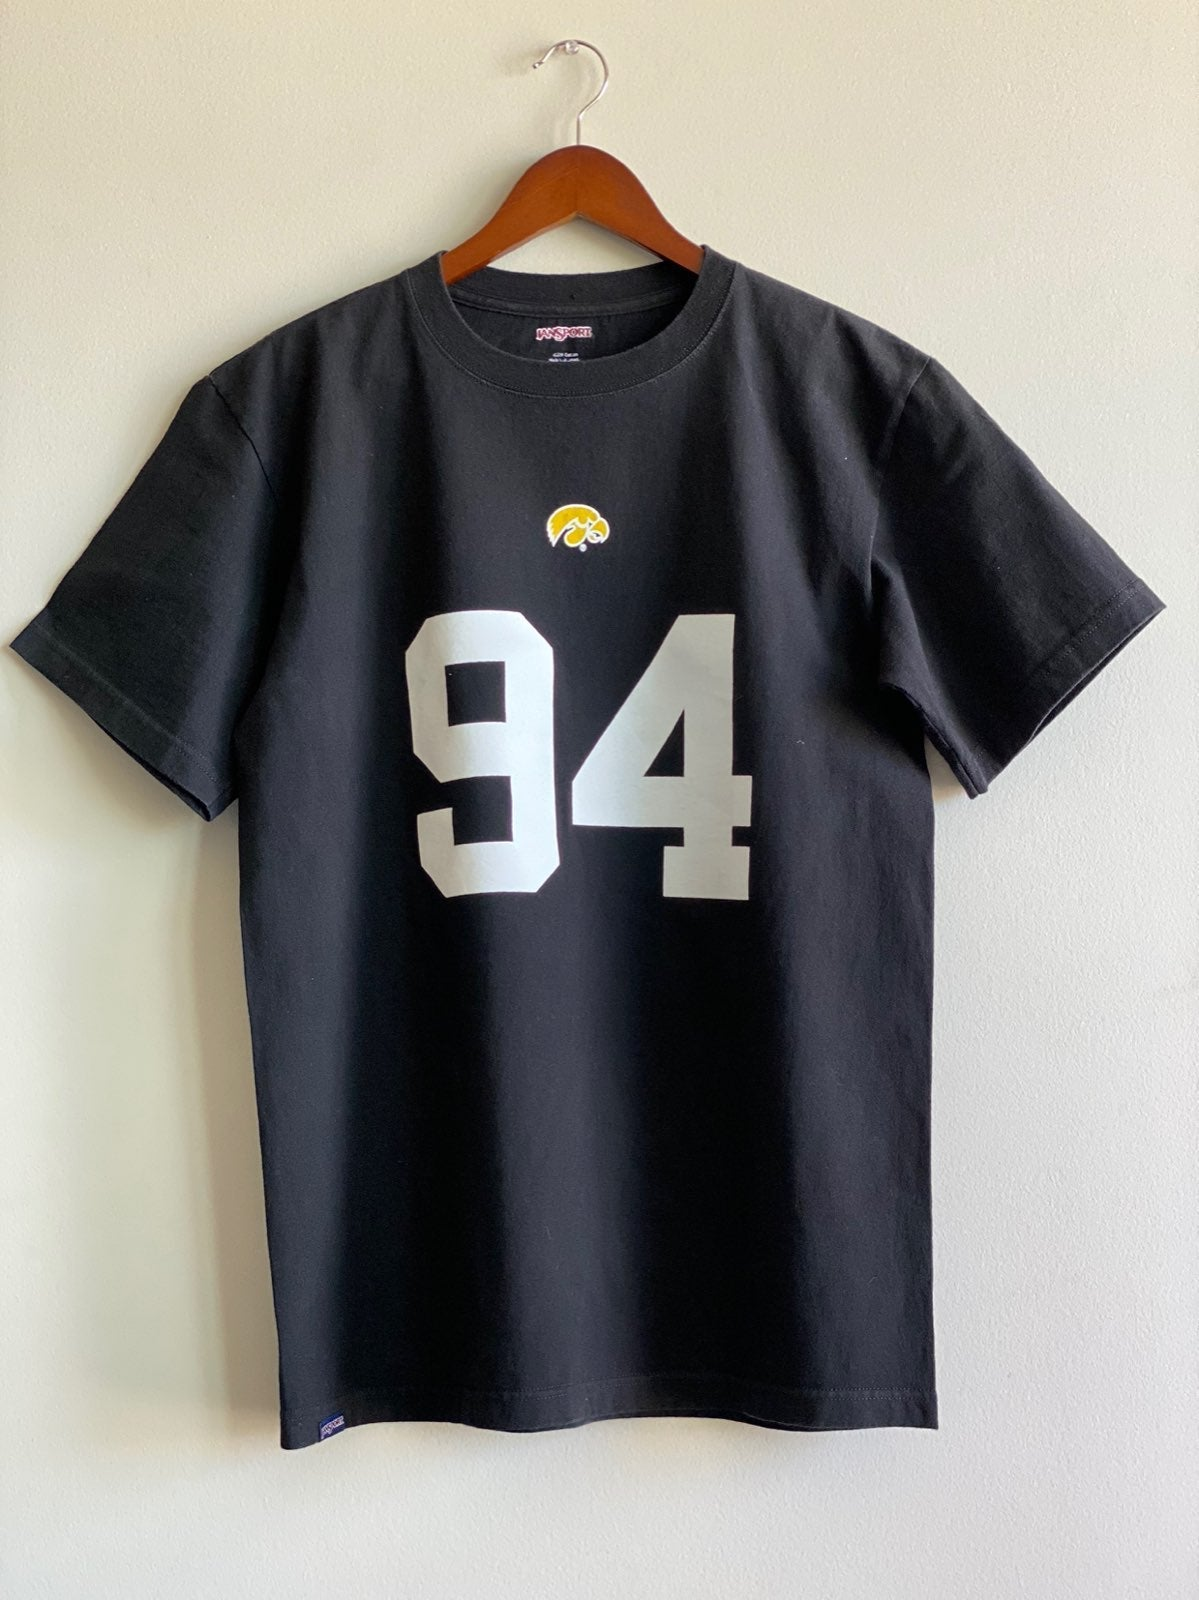 Vintage Iowa Hawkeyes Shirt Sz L